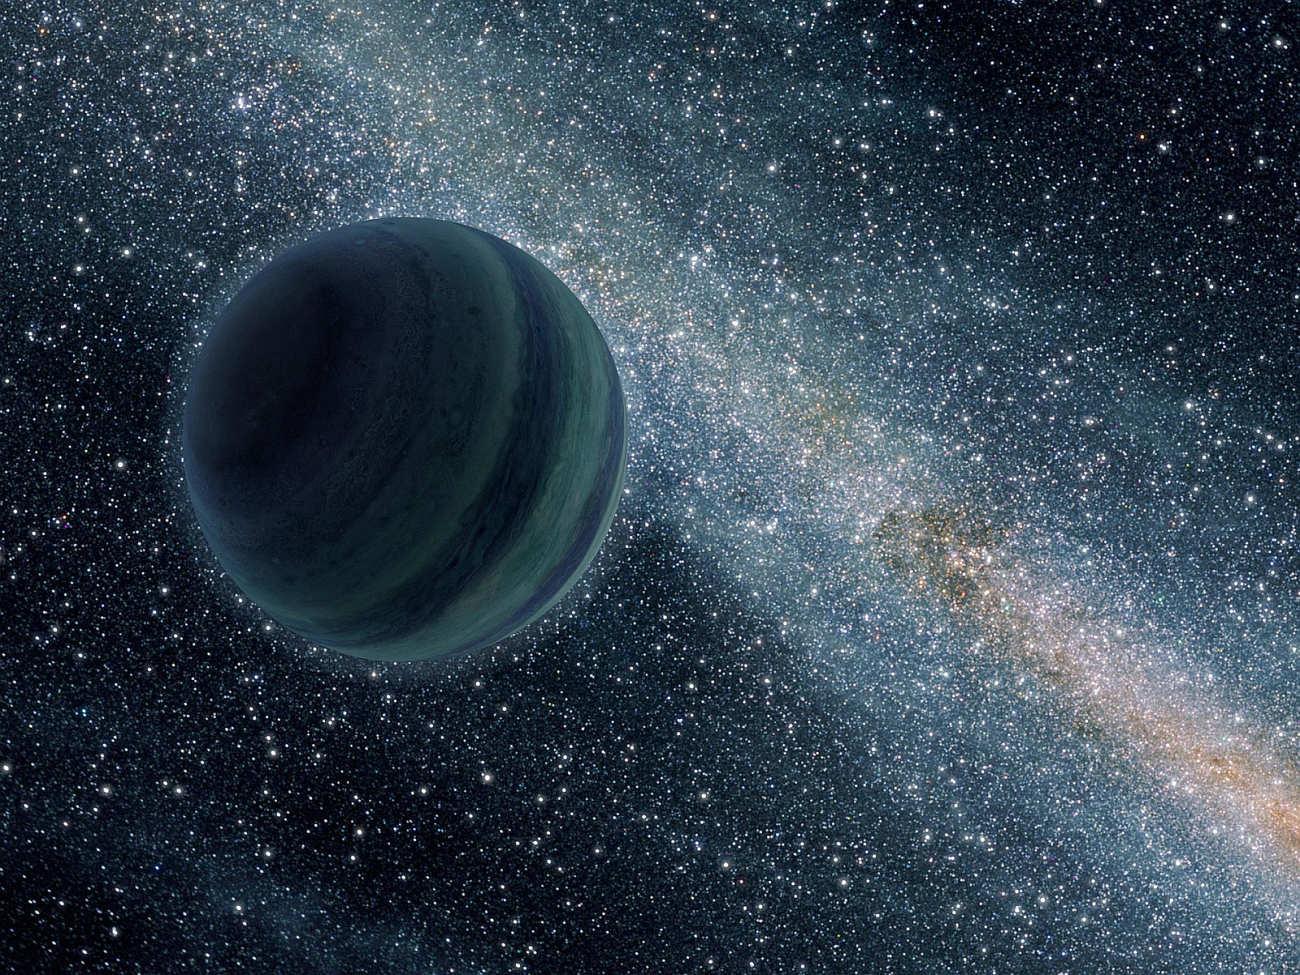 Planeta swobodna - wizualizacja